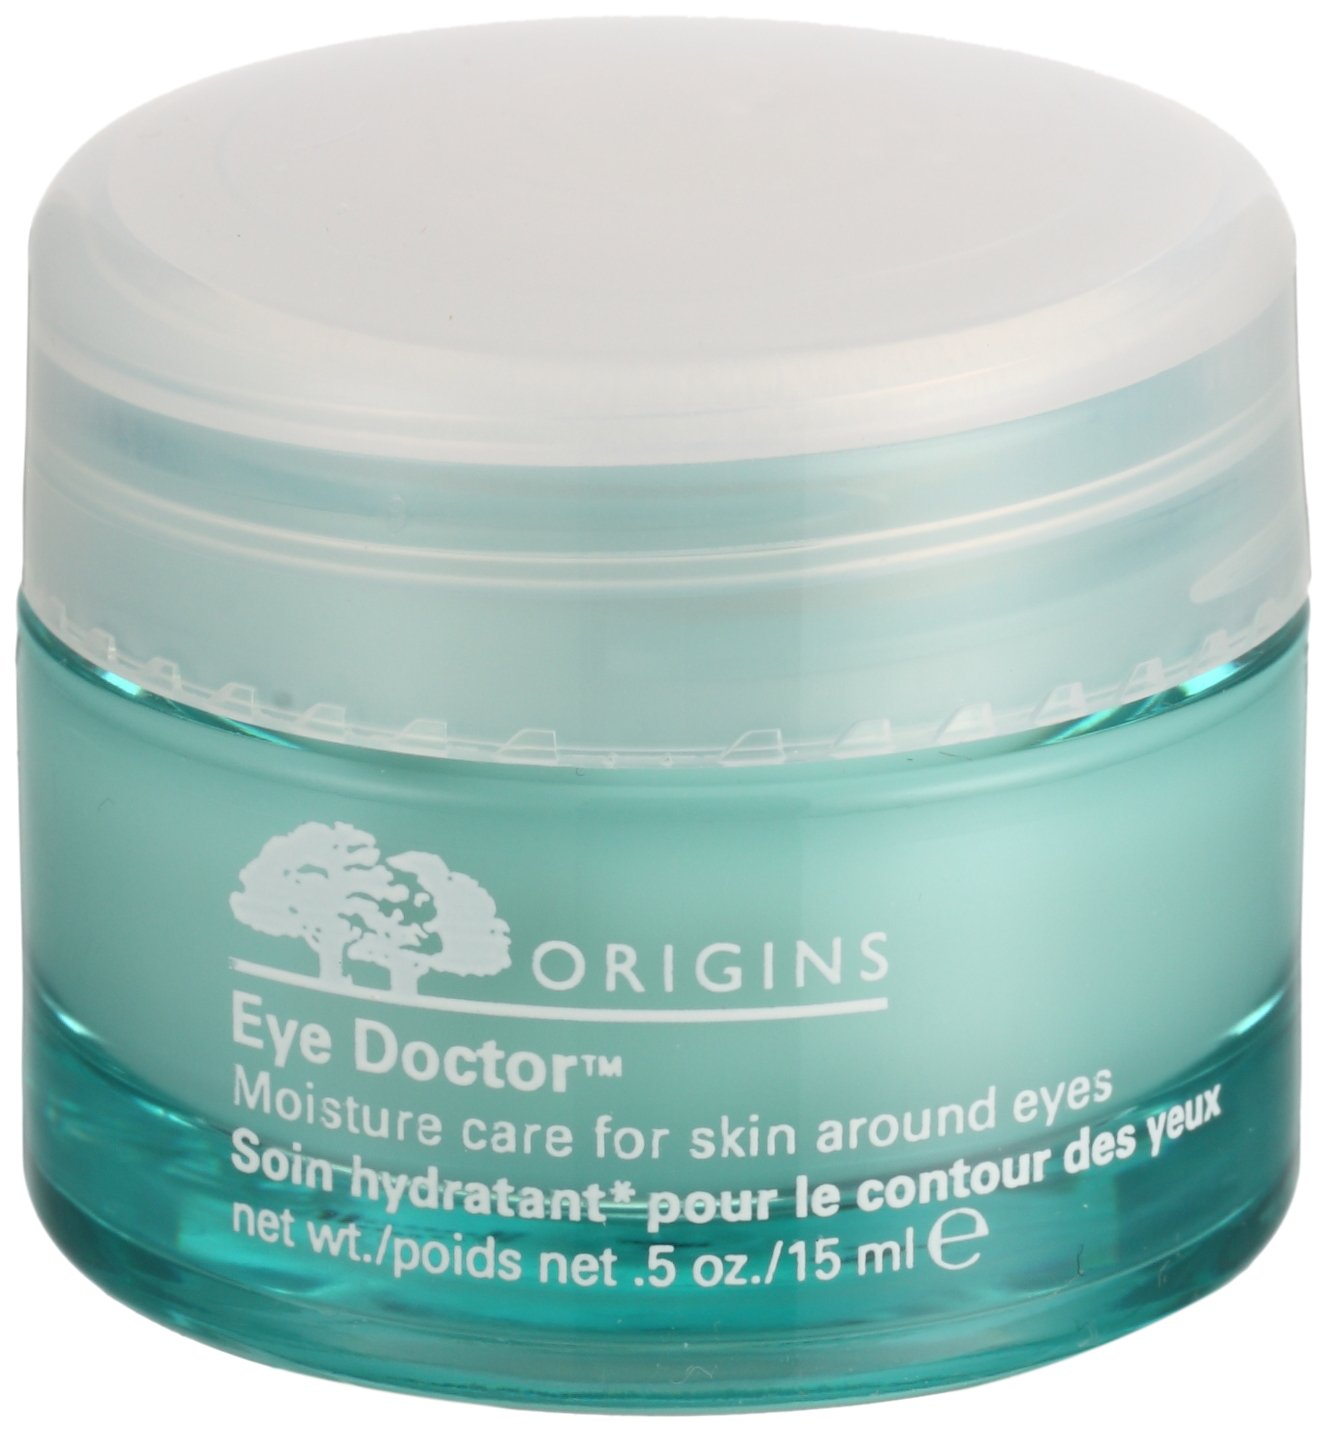 Origins Eye Doctor Moisture Care for Skin Around Eyes, 0.5 Ounces by Origins